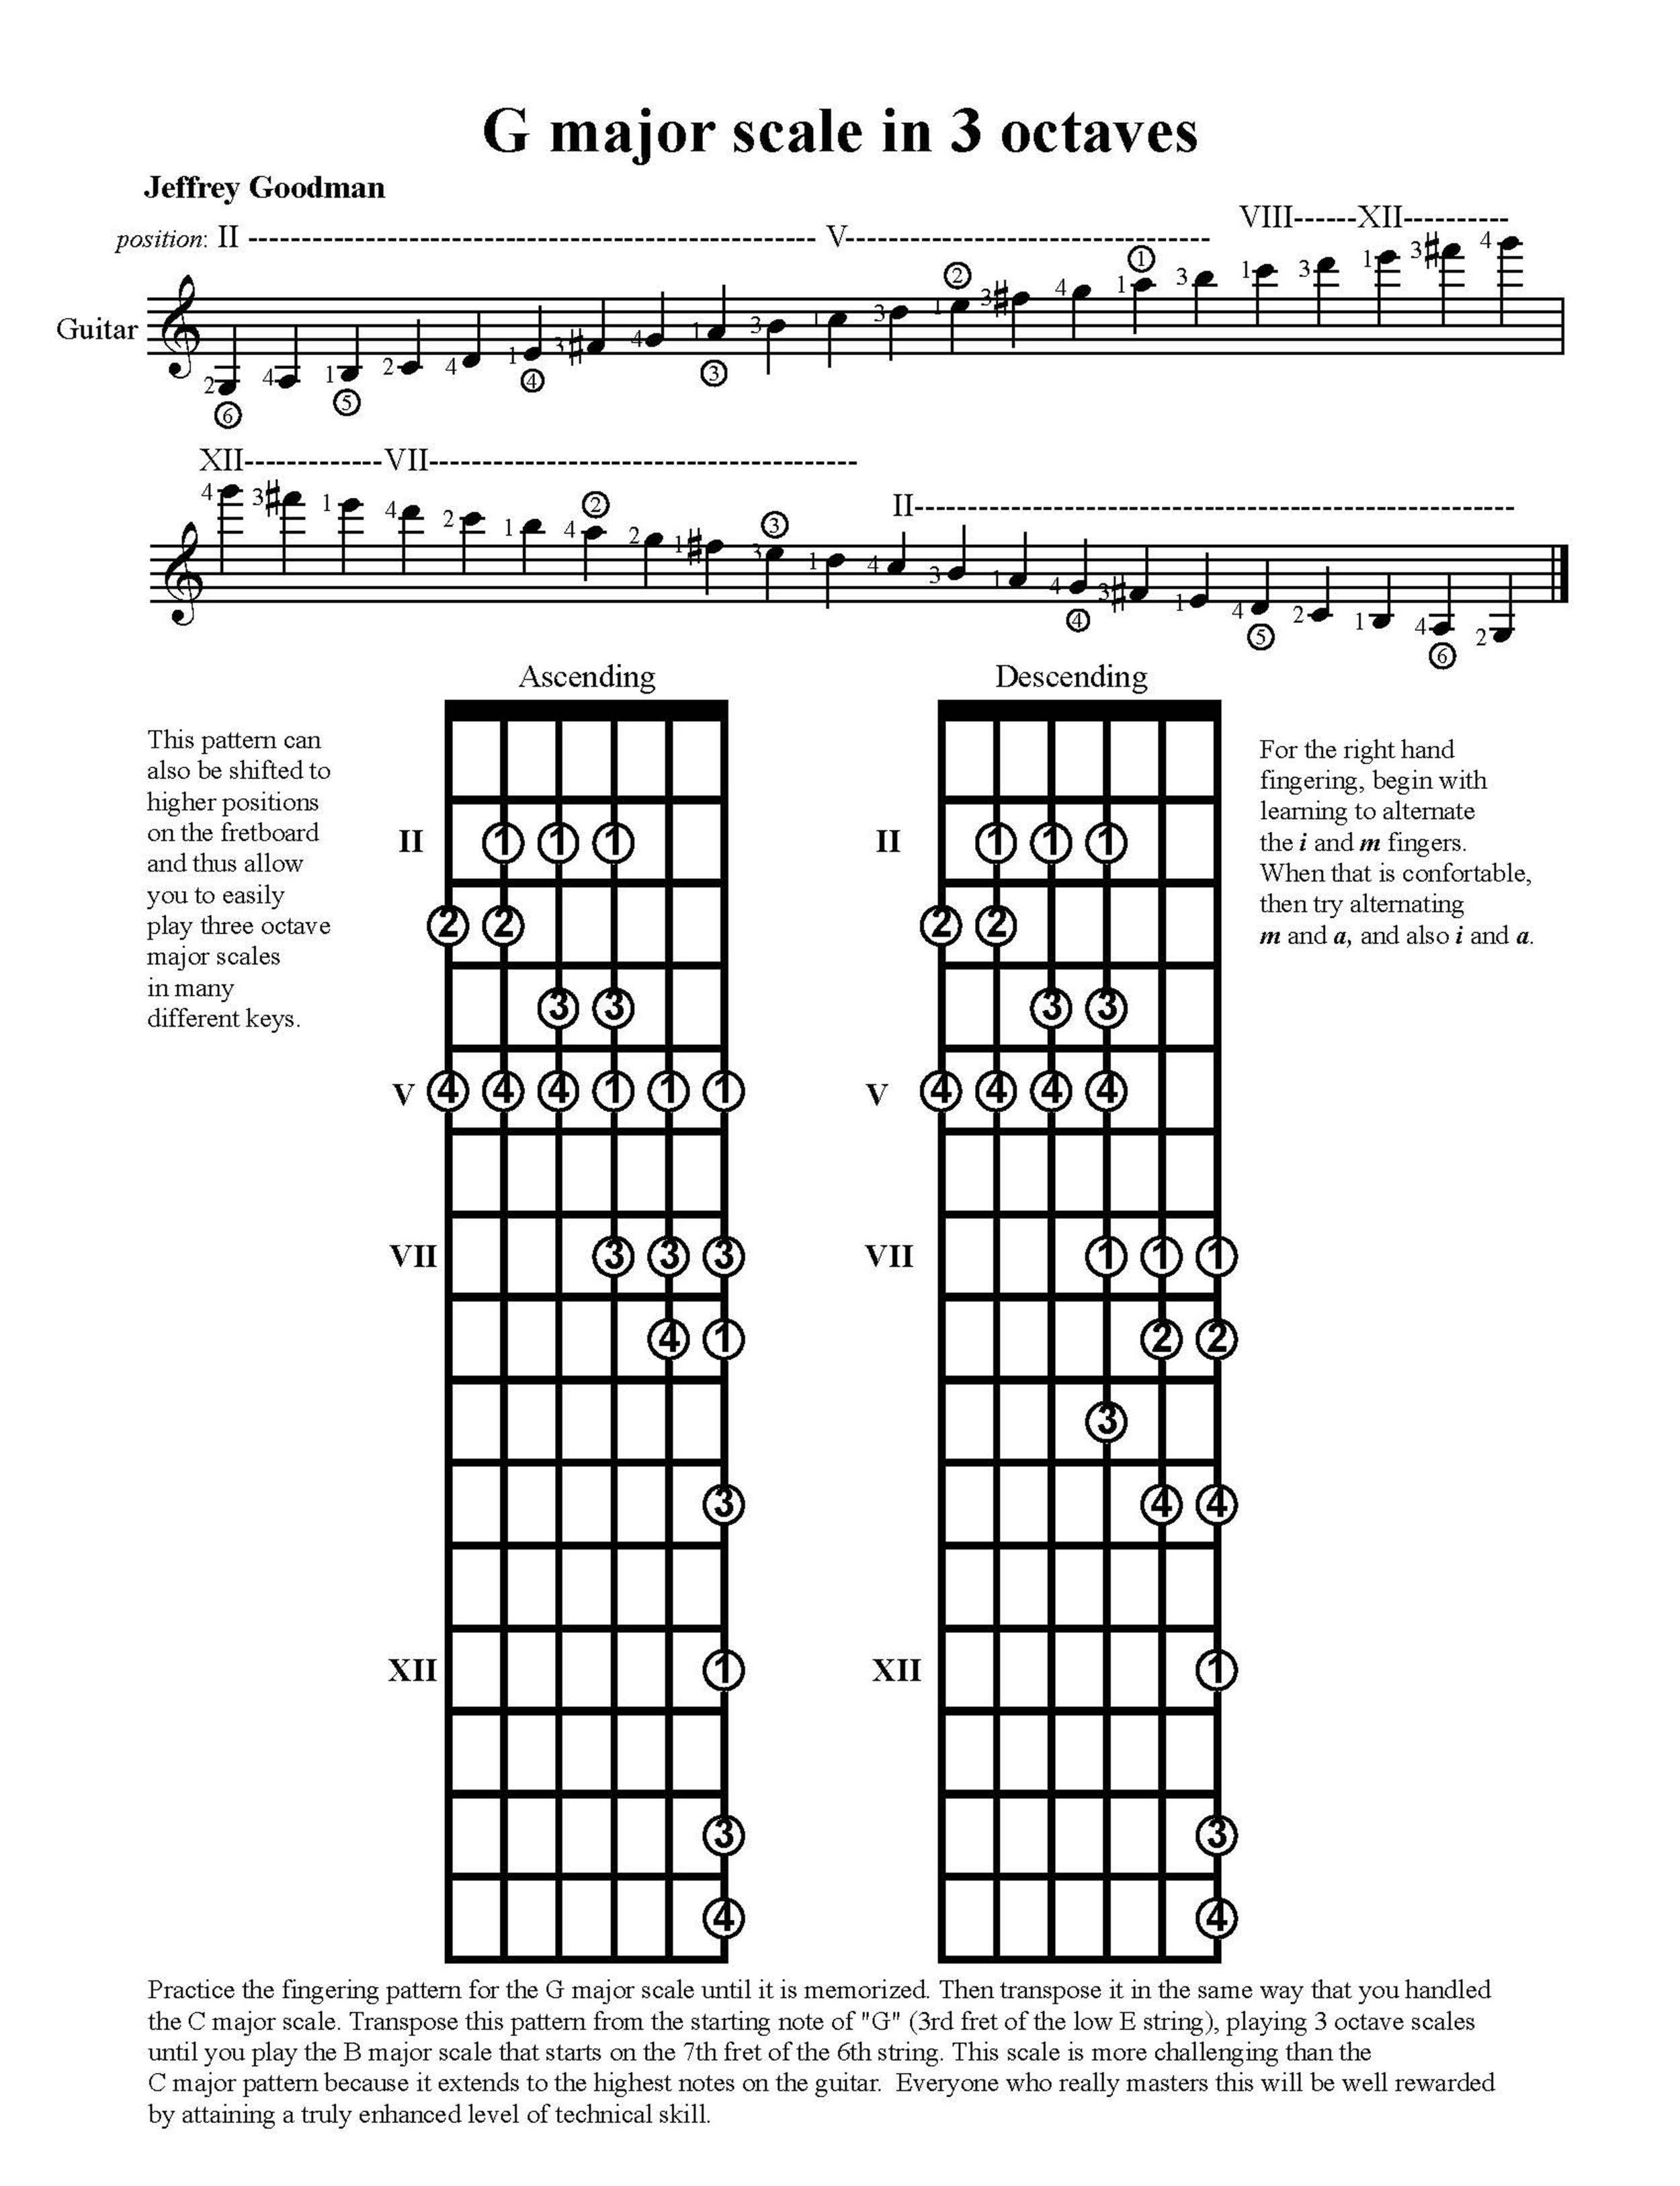 G Major scale - 3 octaves ascending and descending 2.jpg